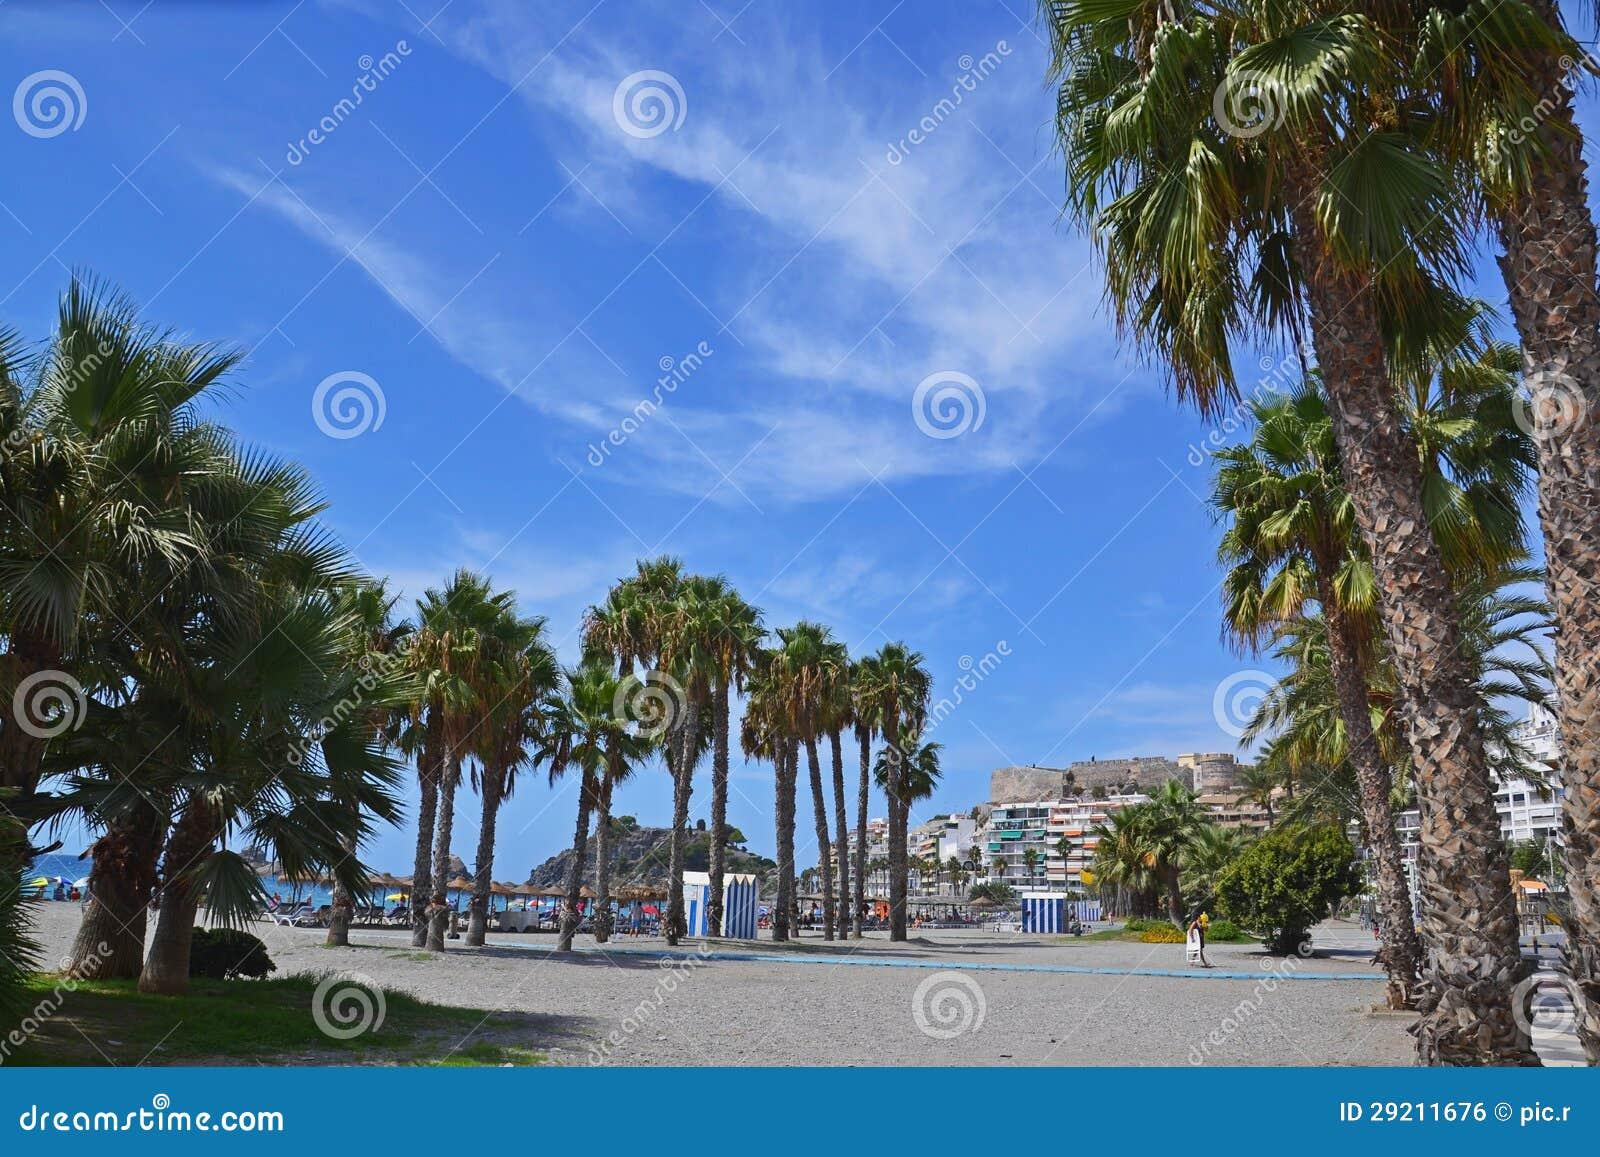 Kurort nadmorski grodzki Almunecar w Hiszpania, panorama